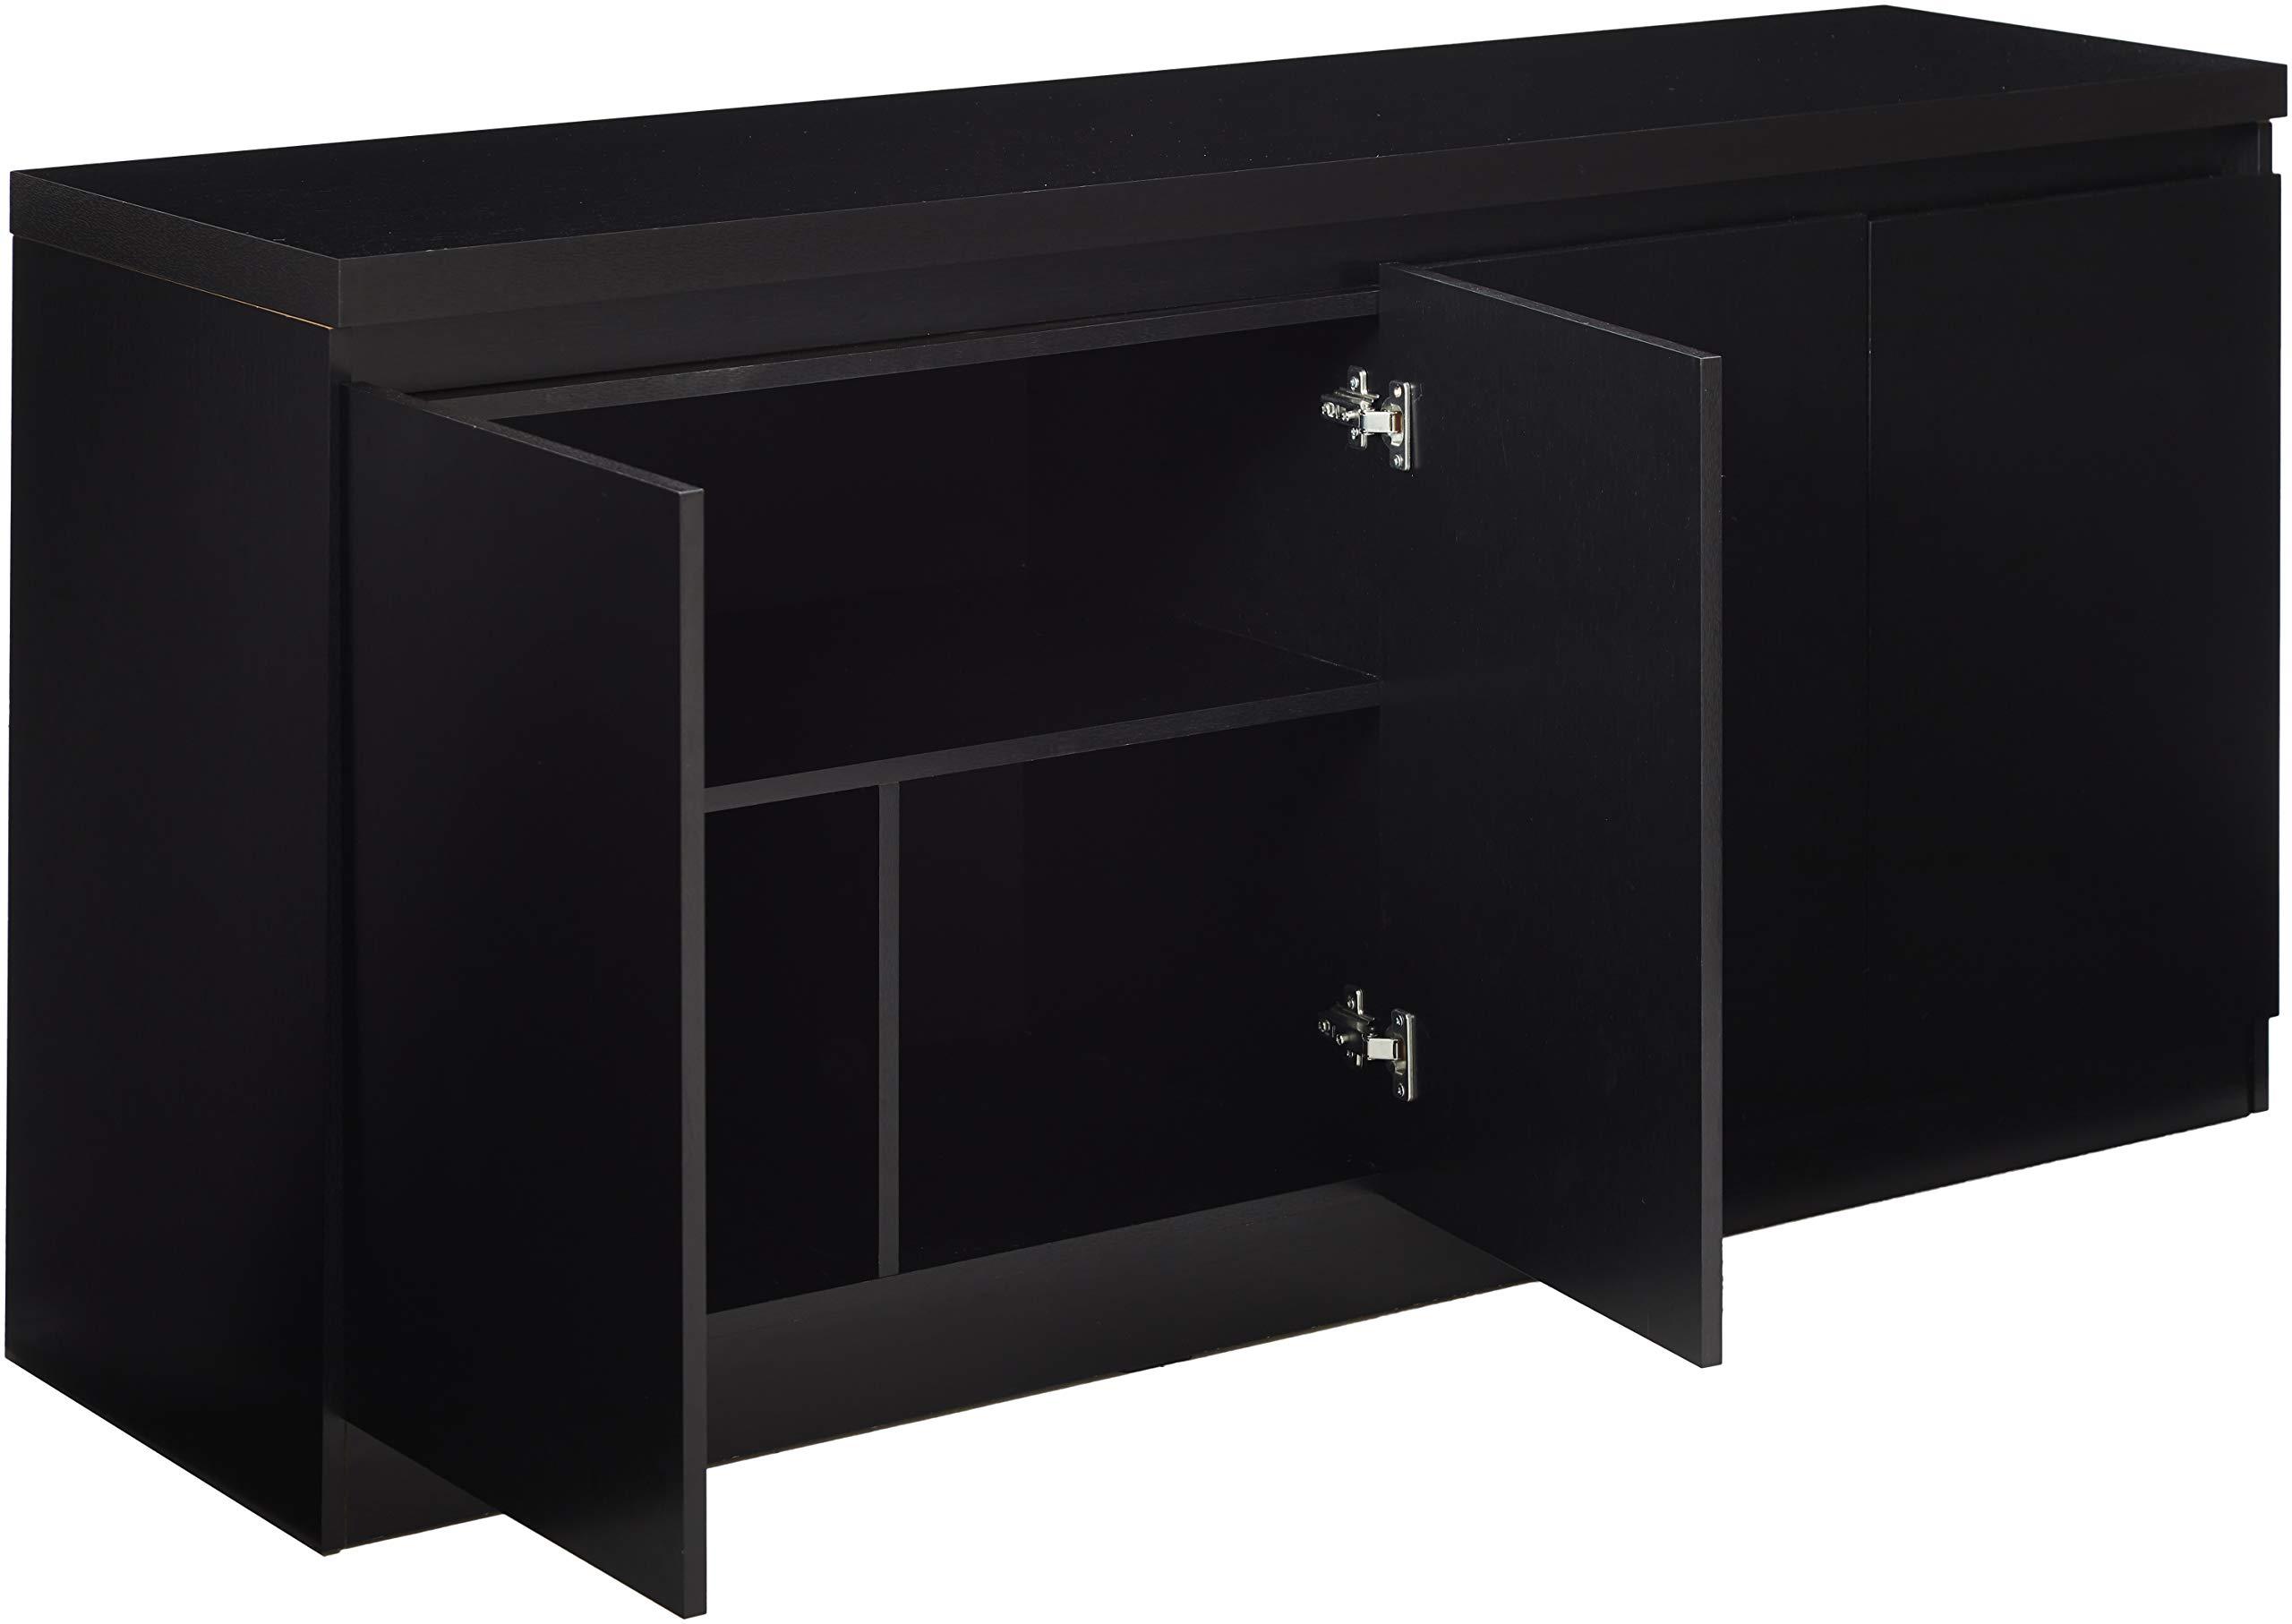 Manhattan Comforts 100653-MC Viennese Sideboard Black Matte by Manhattan Comforts (Image #3)